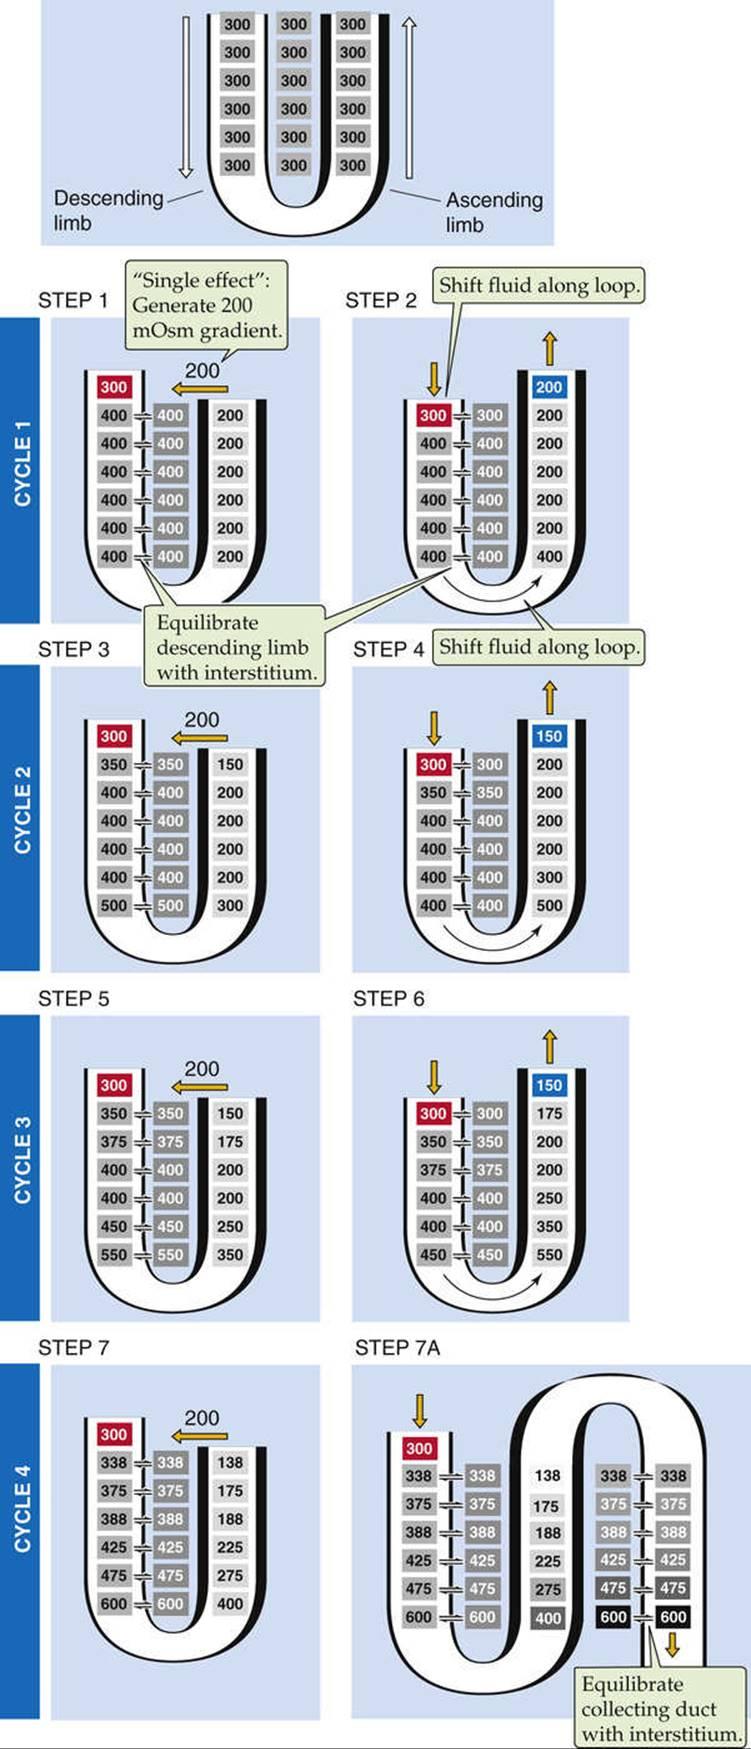 boron boulpaep medical physiology 3rd edition pdf